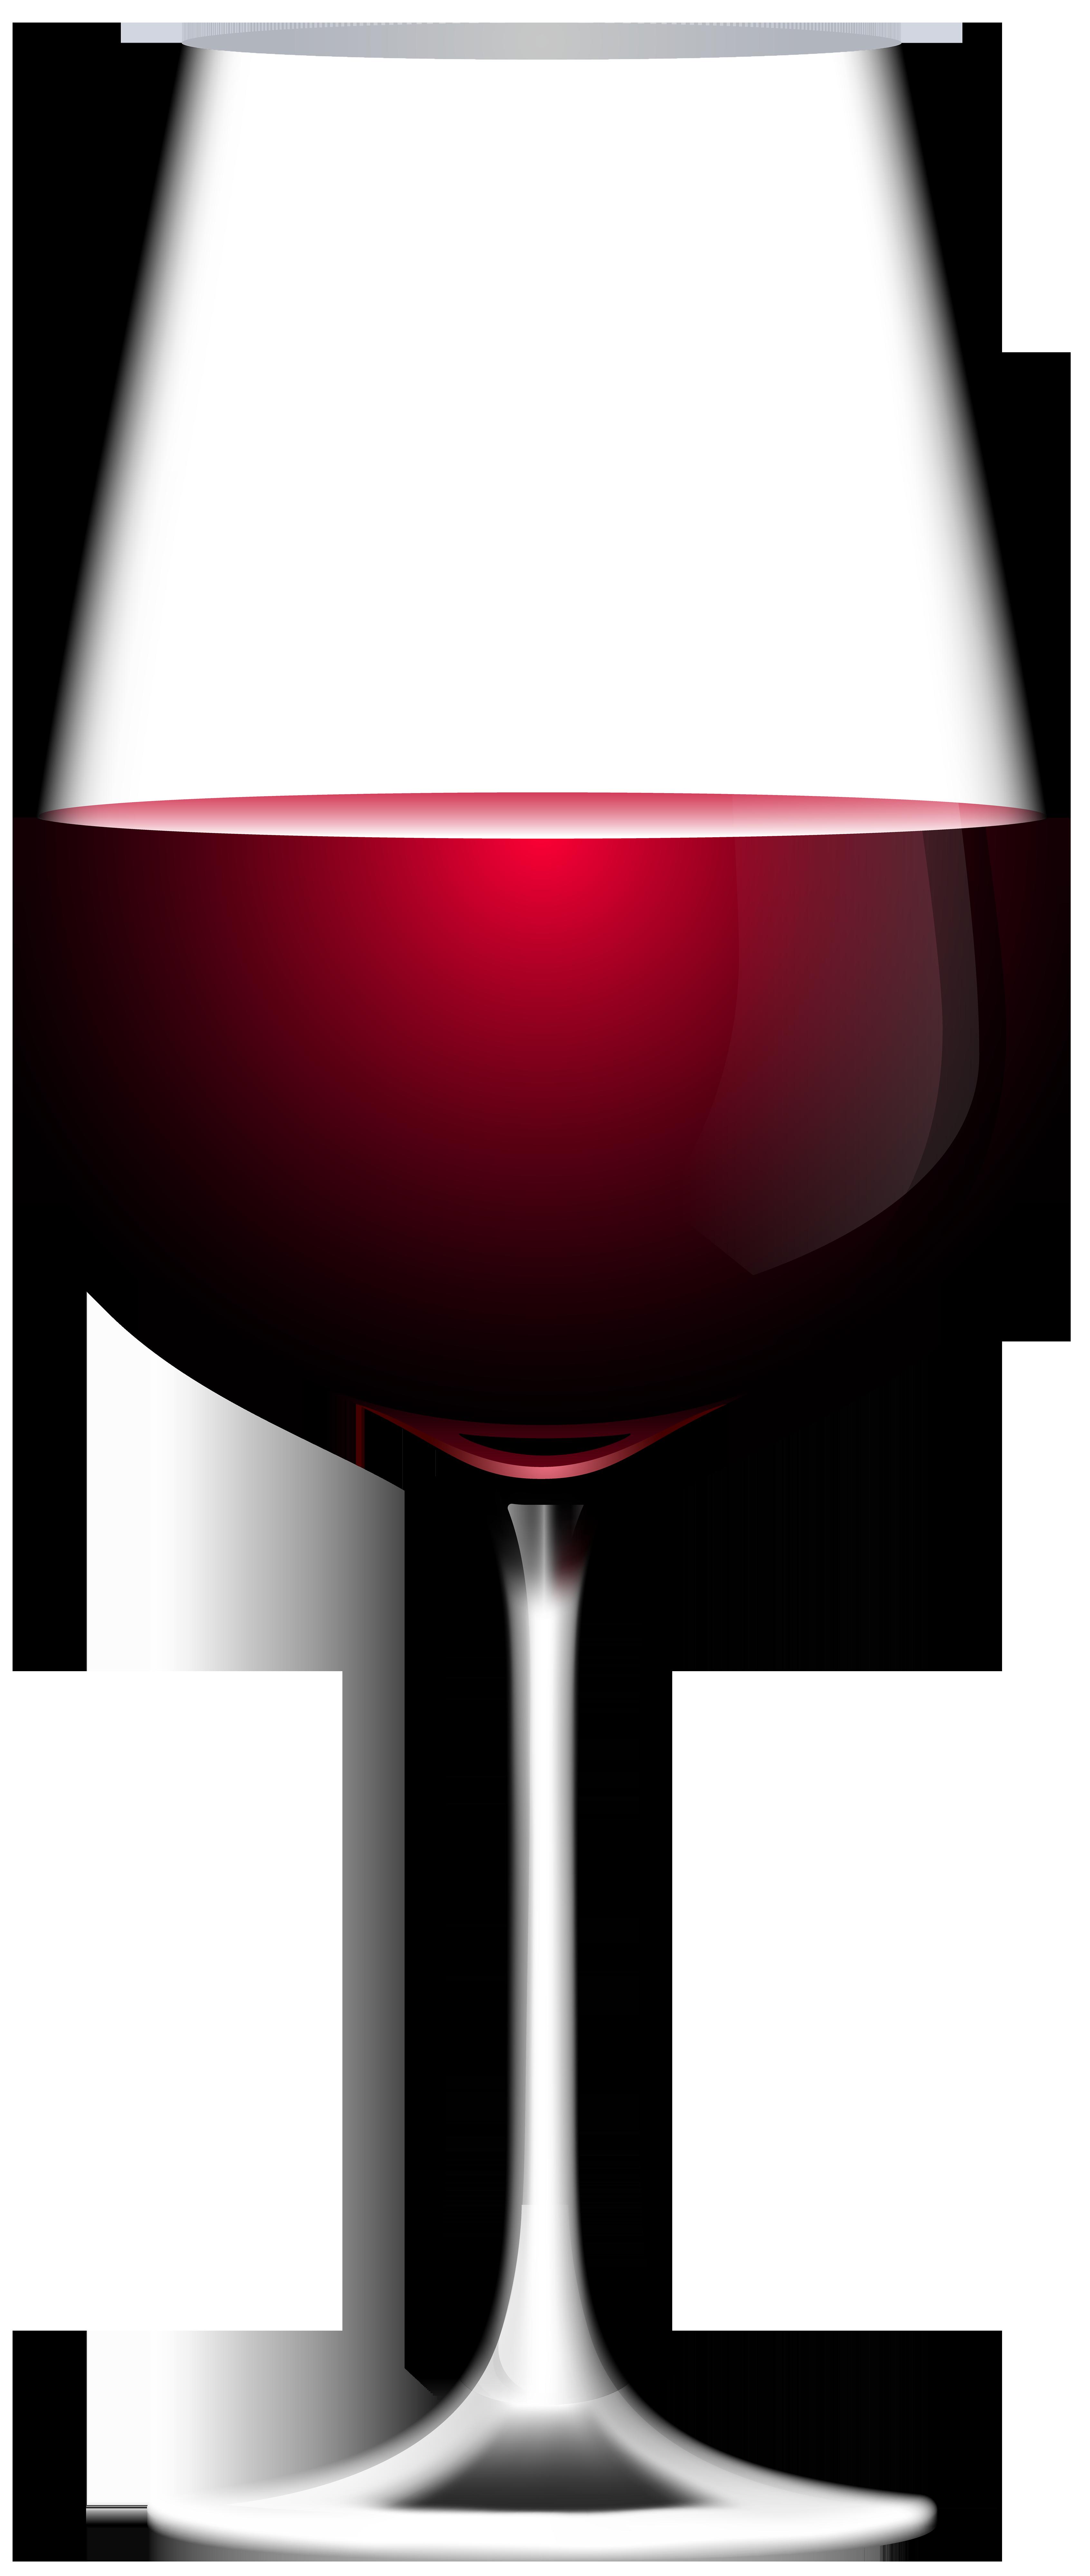 Red Wine Glass Transparent Clip Art Image.